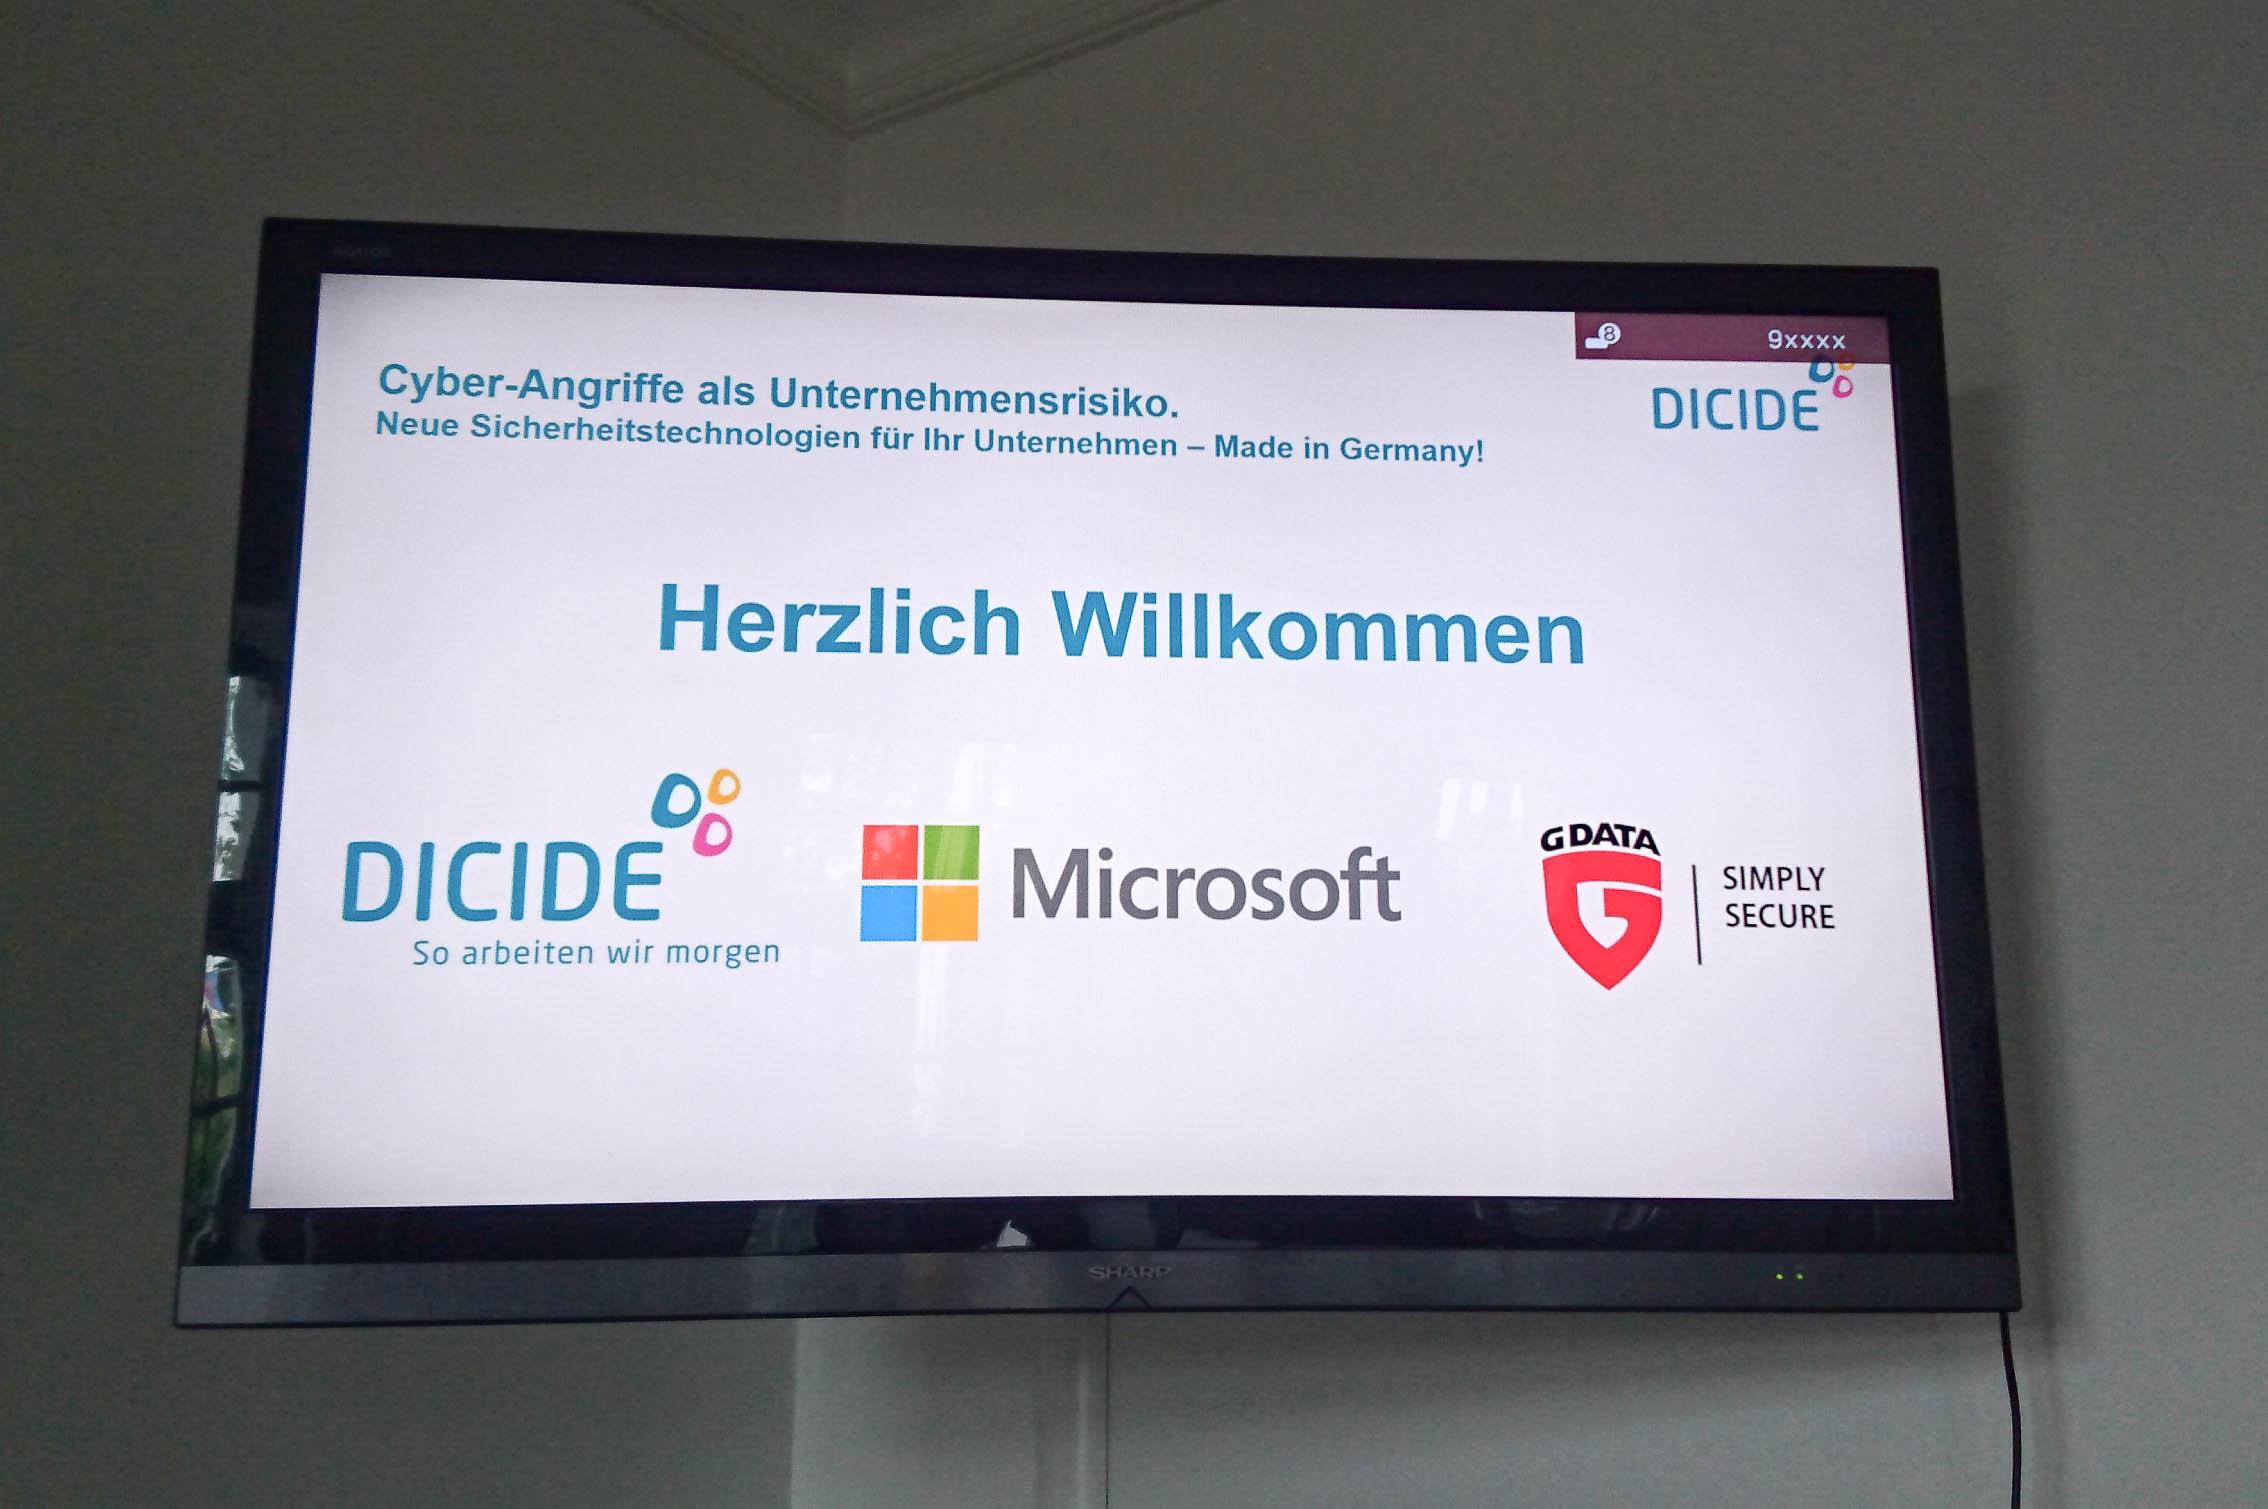 Cyber-Angriffe als Unternehmensrisiko